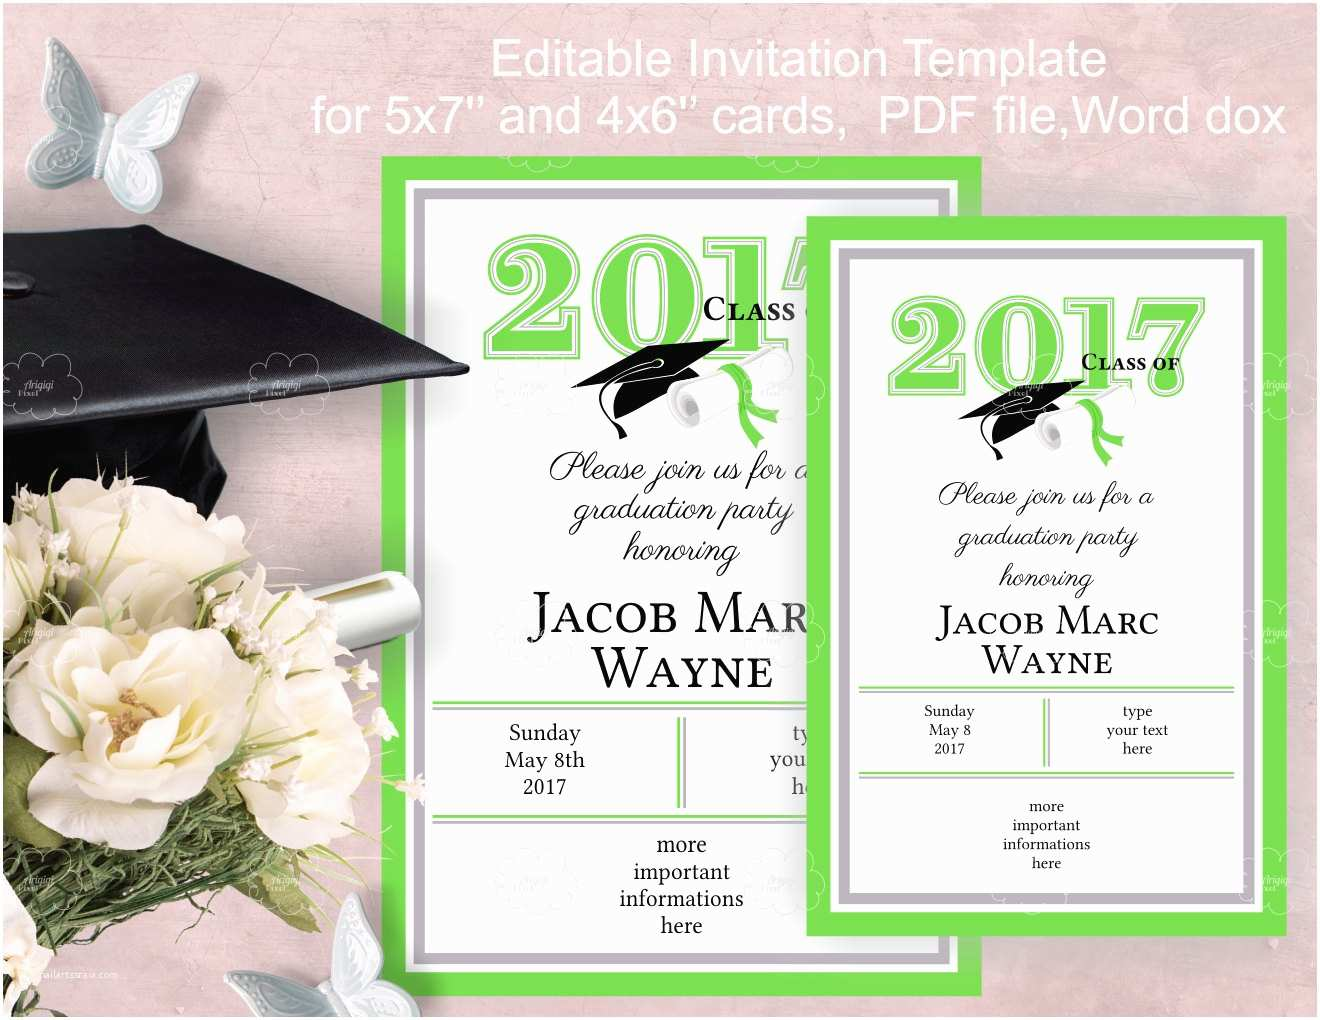 Graduation Party Invitations Templates Graduation Party Invitation Template Edit Yourself